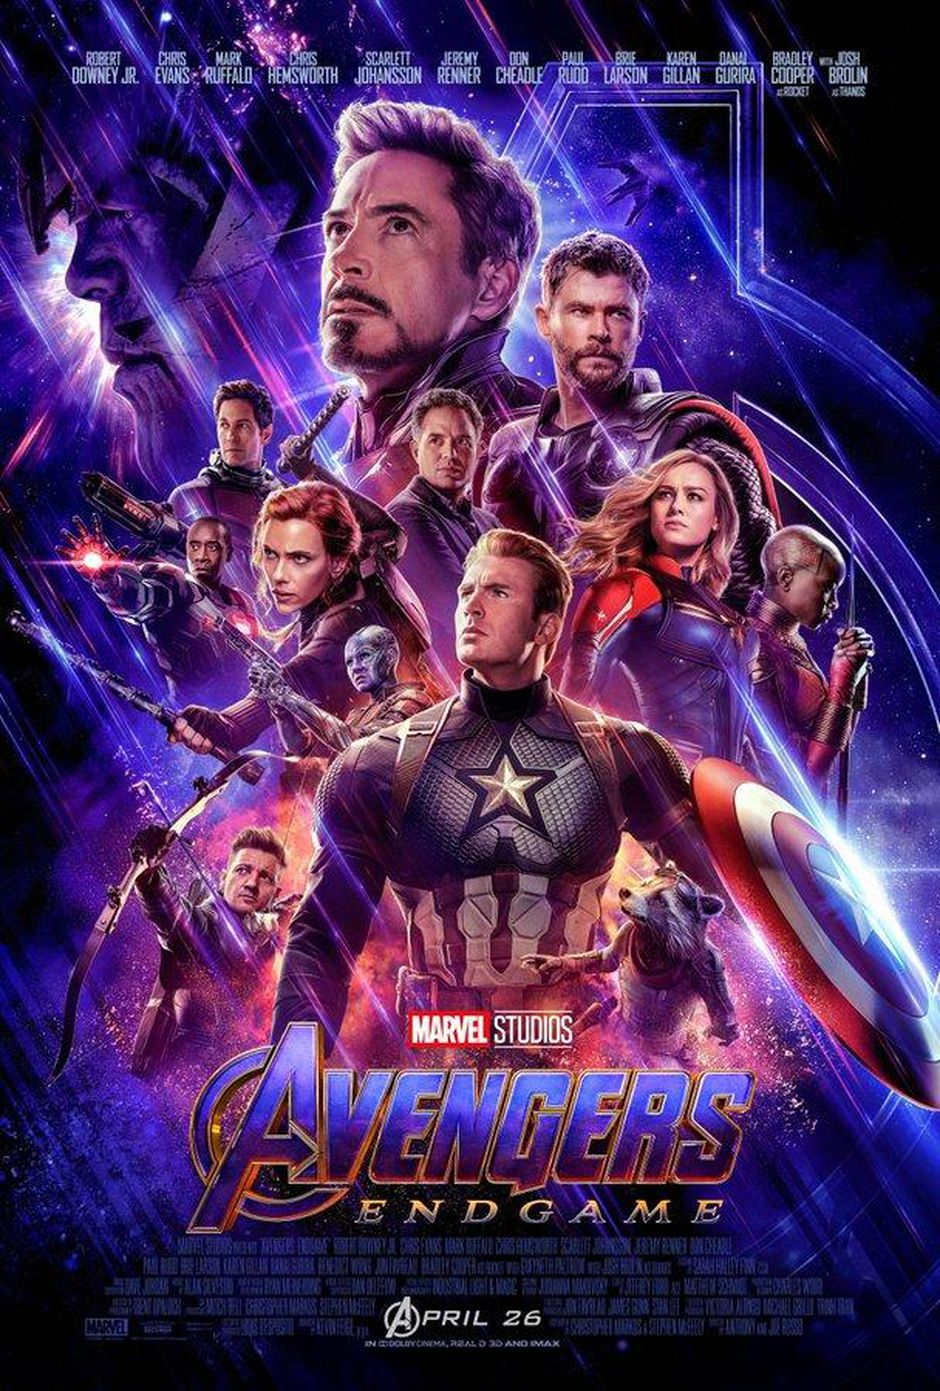 Avengers: Endgame - April 25th, 2019